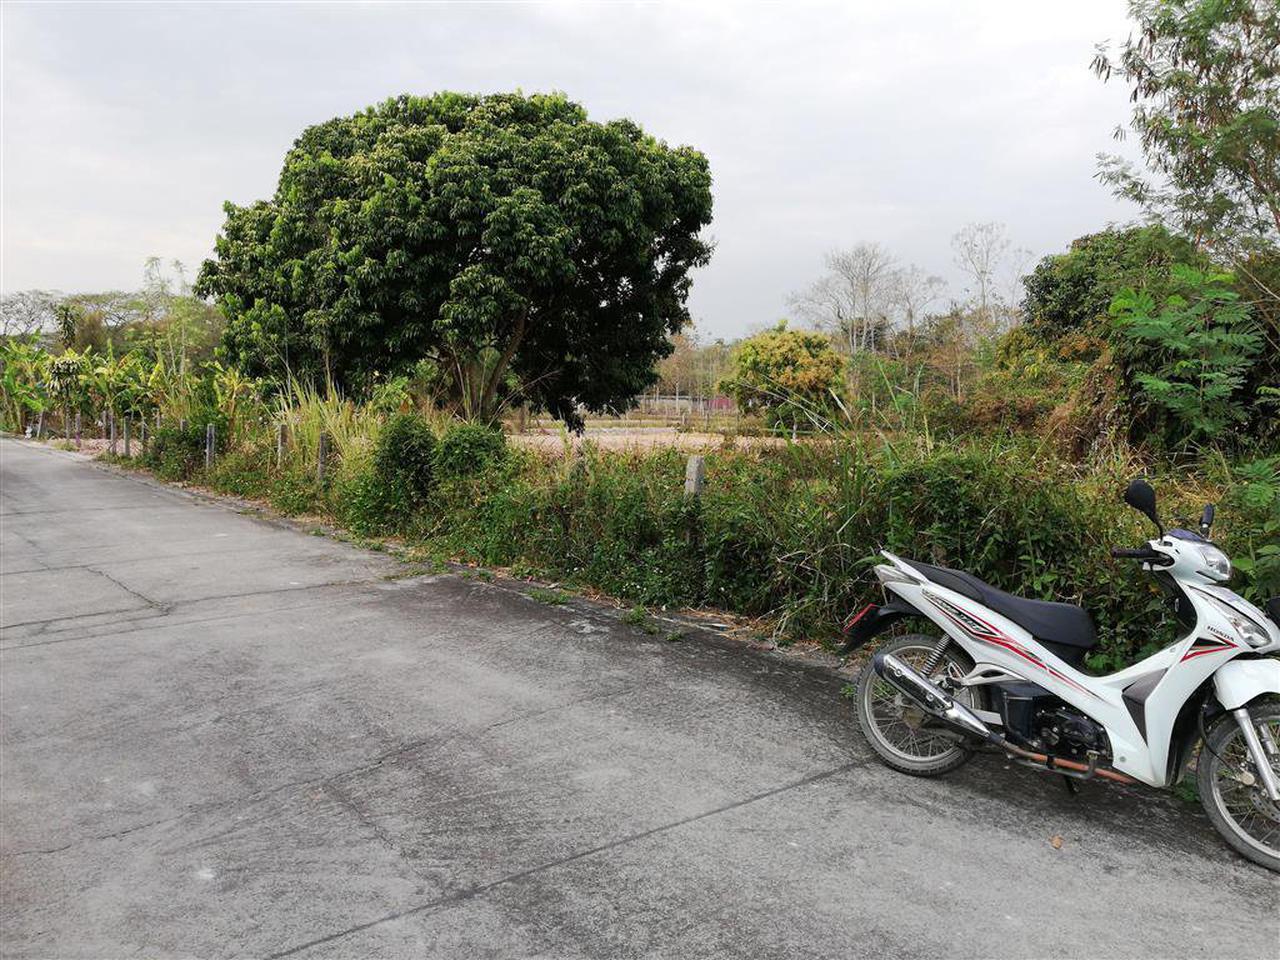 SS158ขายที่ดินเปล่าเนื้อที่0-2-09ไร่ติดถนนคอนกรีตที่เชื่อมกั รูปที่ 2